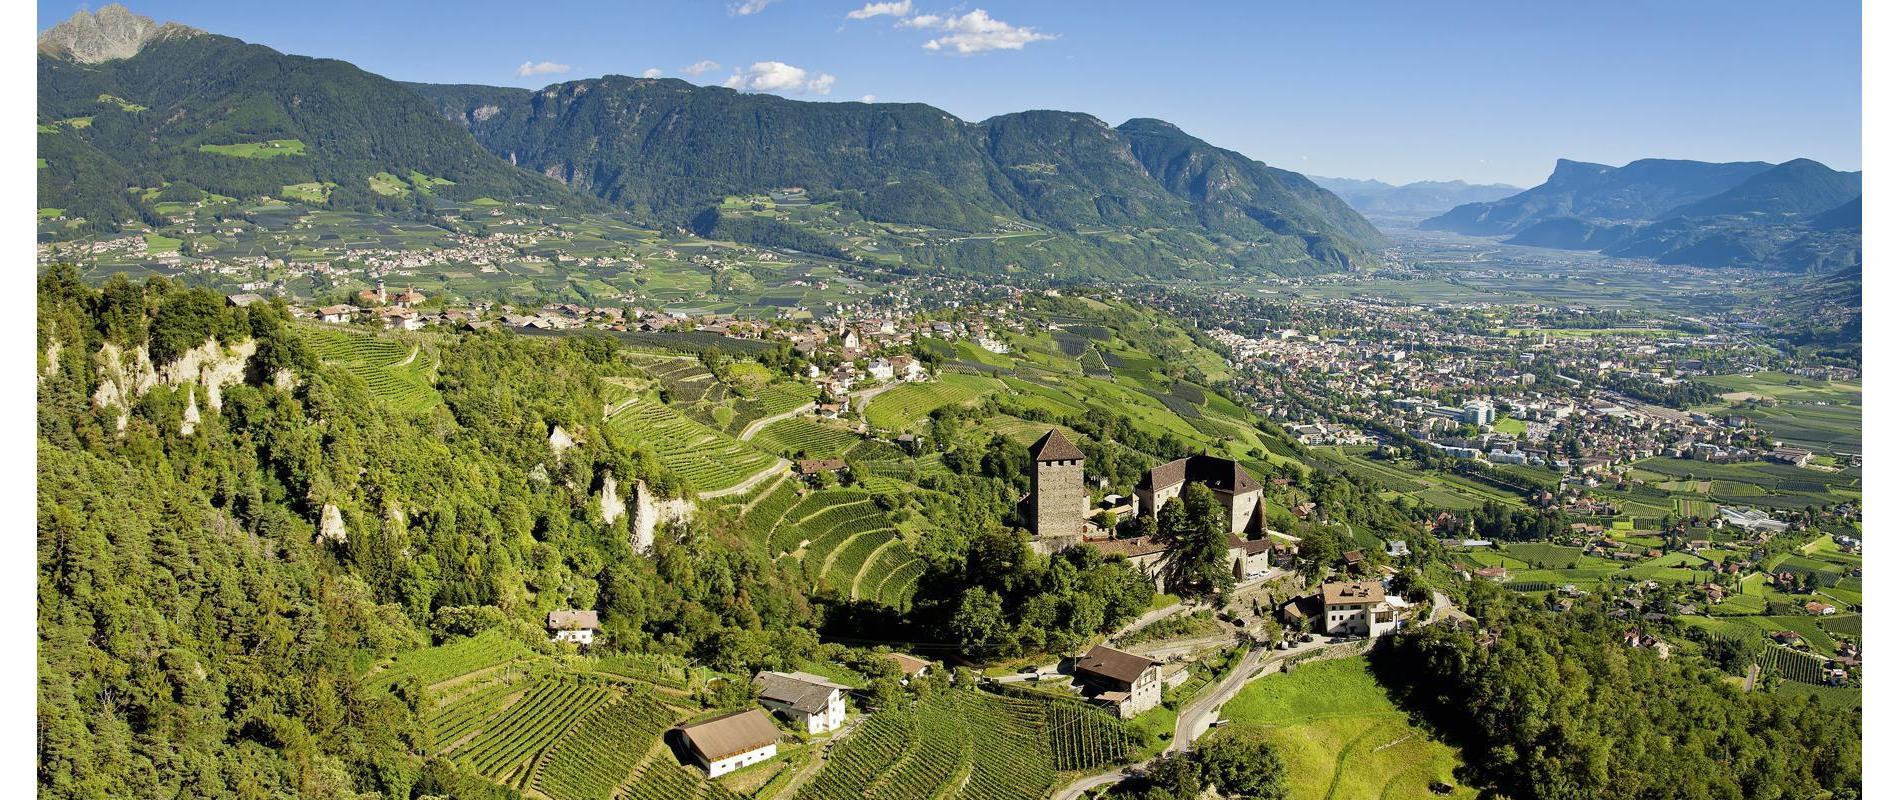 Menù Tirolese… al gusto di Birra!